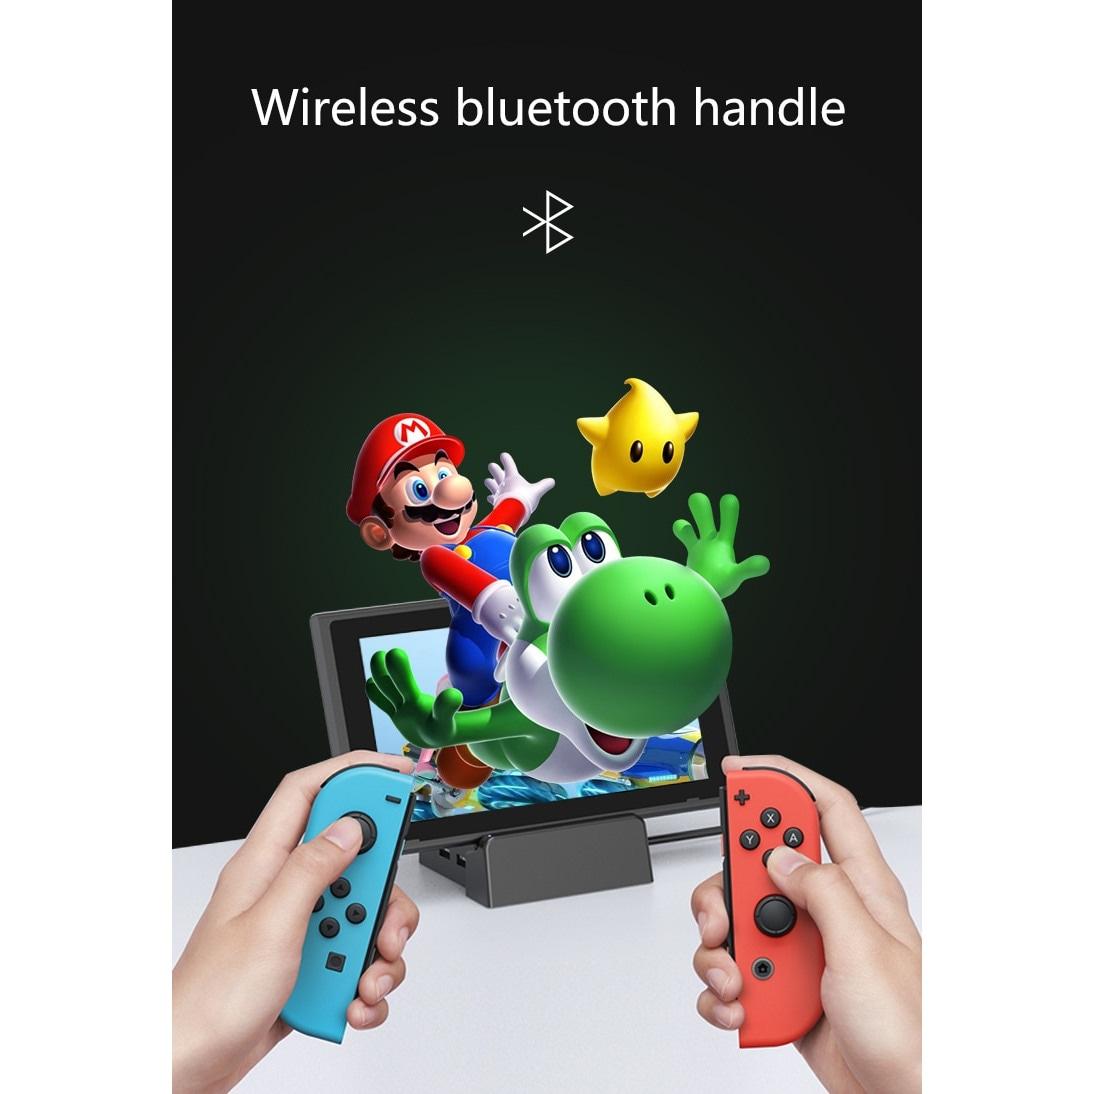 Wireless Joysticks for Nintendo Switch (L and R) Green - 5